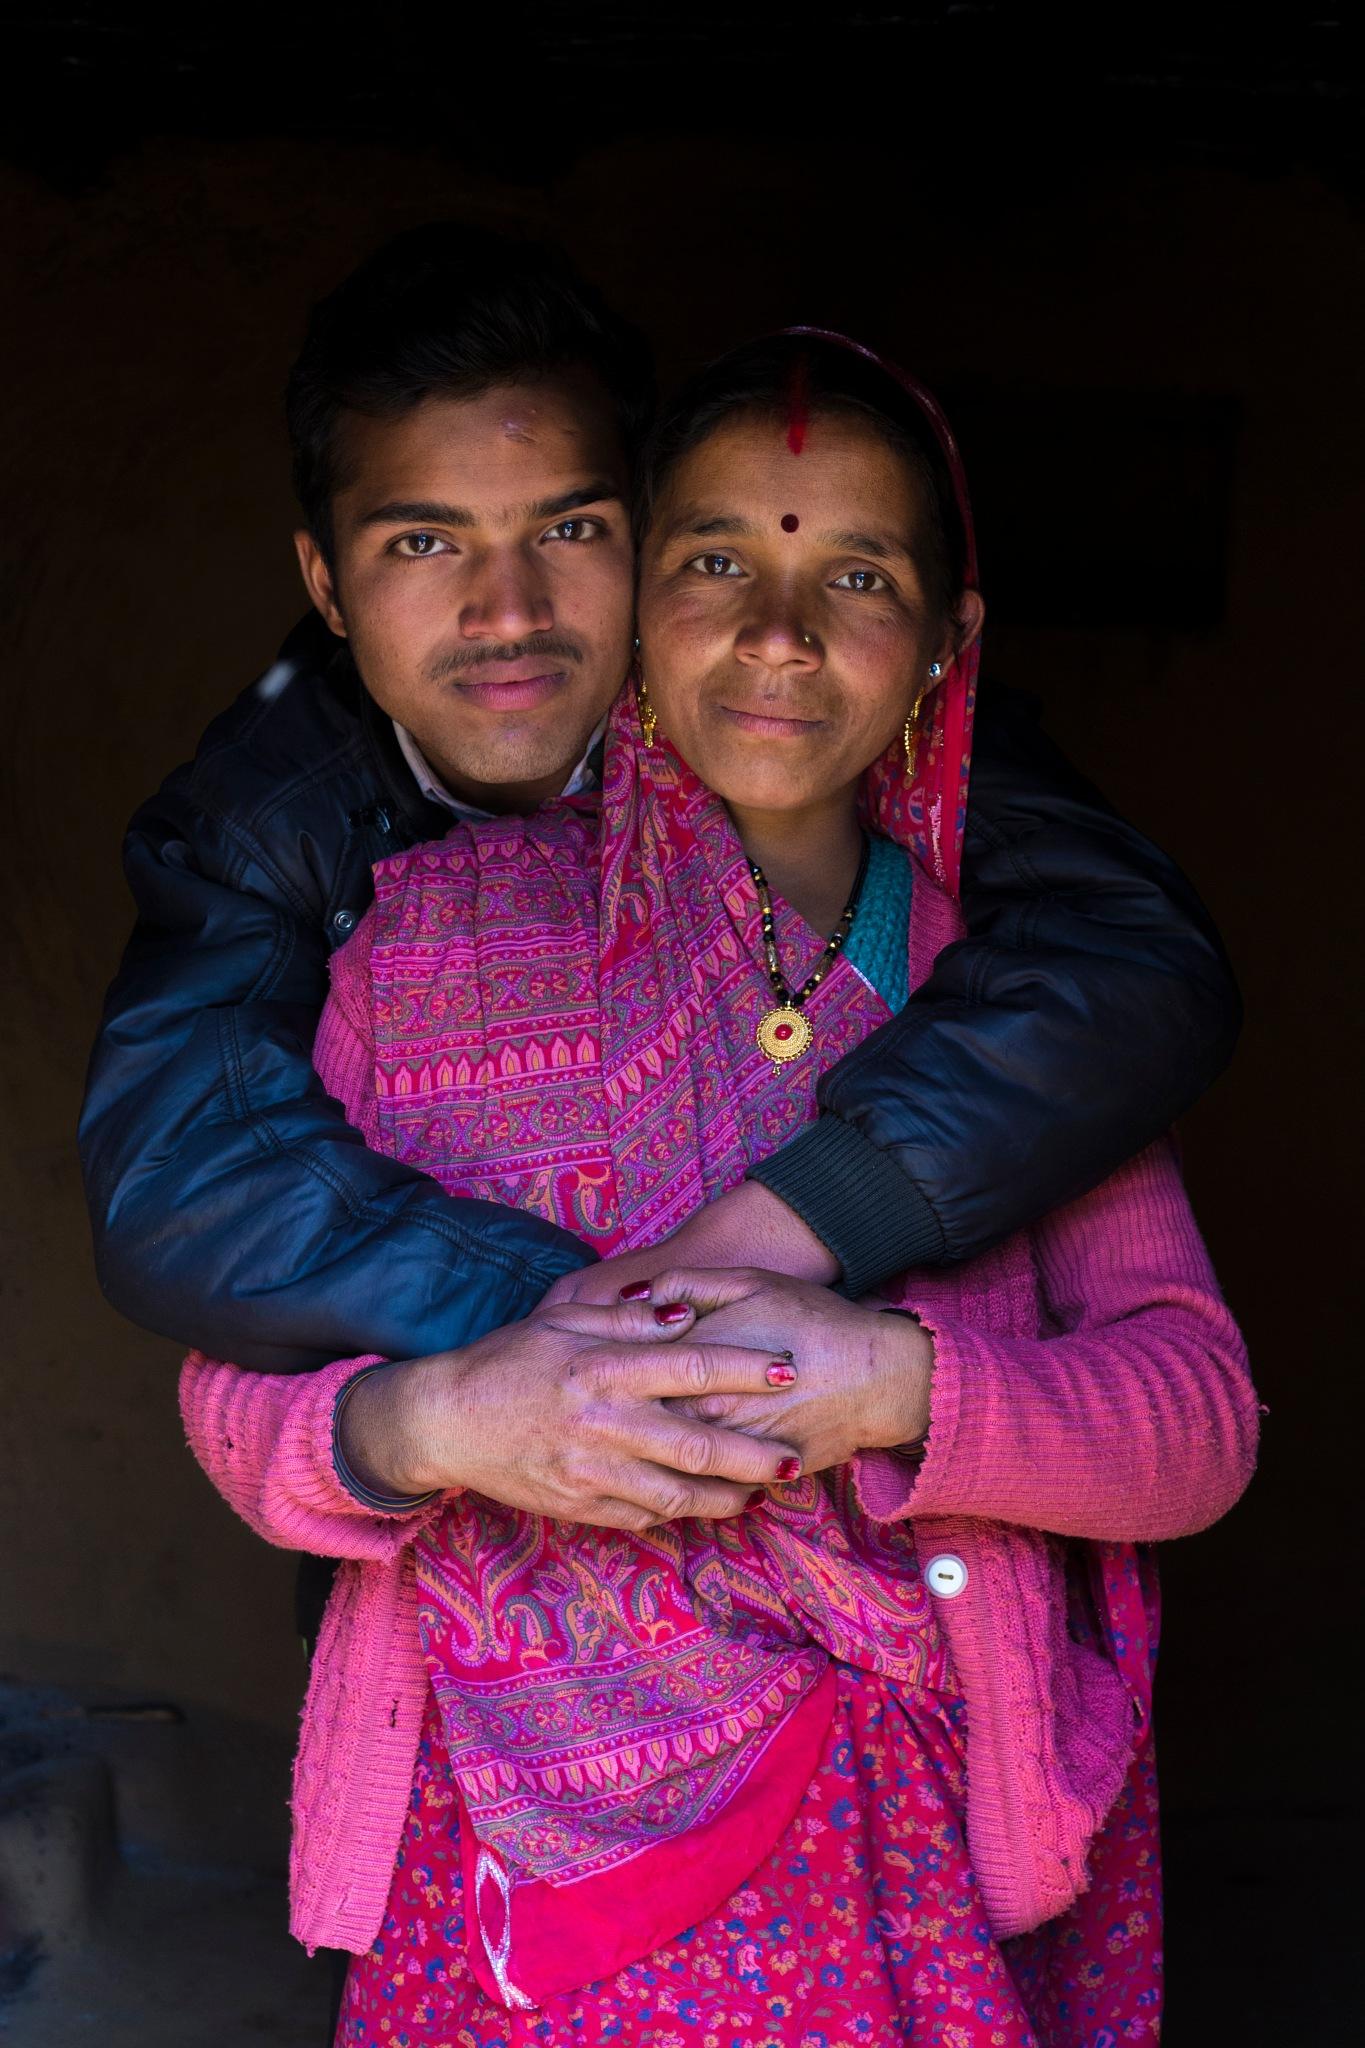 mom and son by Makesh Bala Murugan